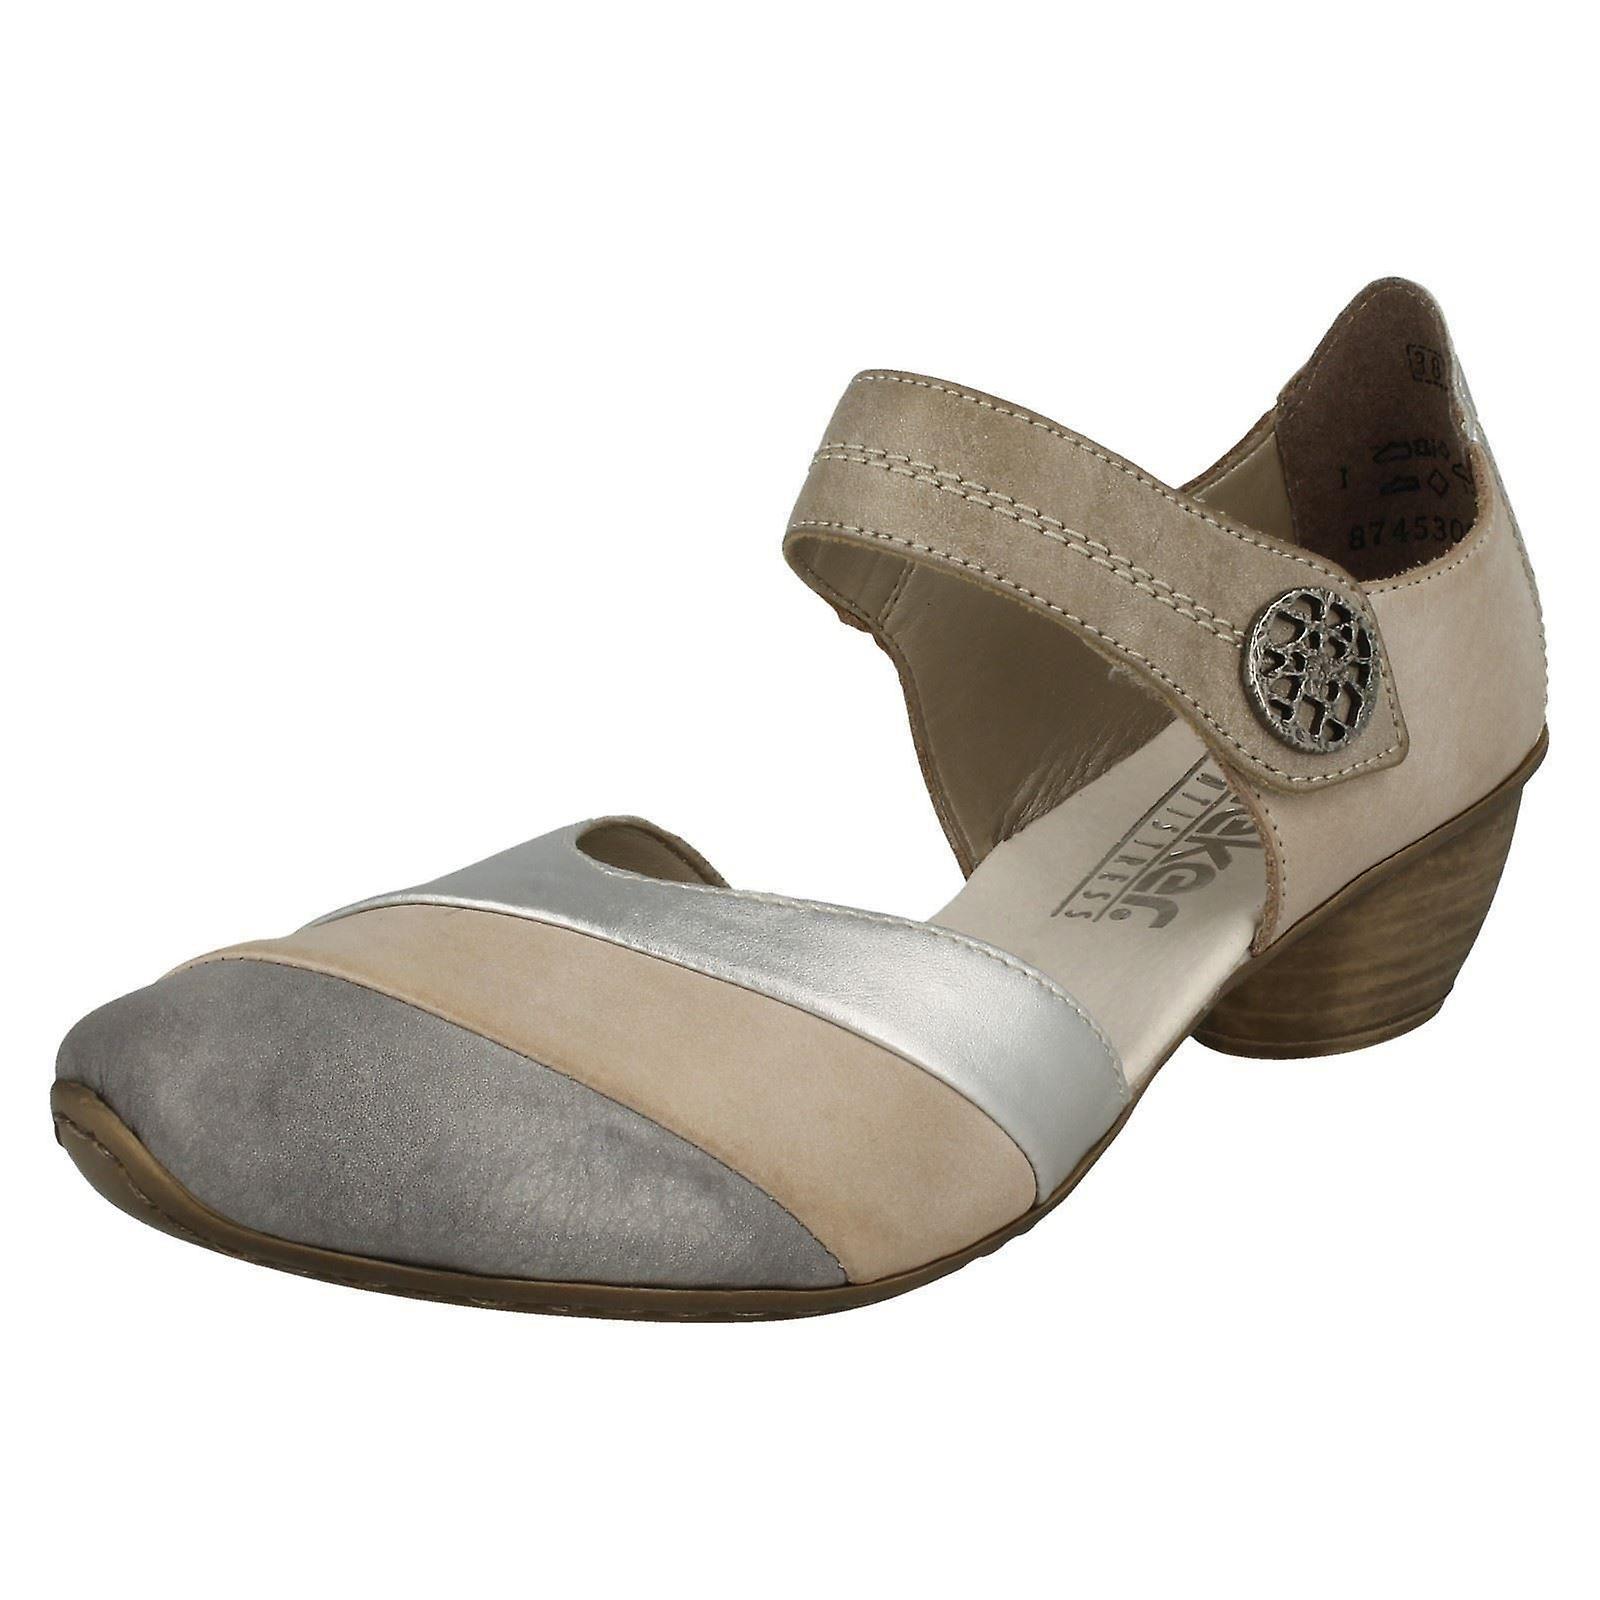 8b9d1dc2a14 Ladies Rieker Heeled Casual Shoes Shoes Shoes 43790 2b0688 ...